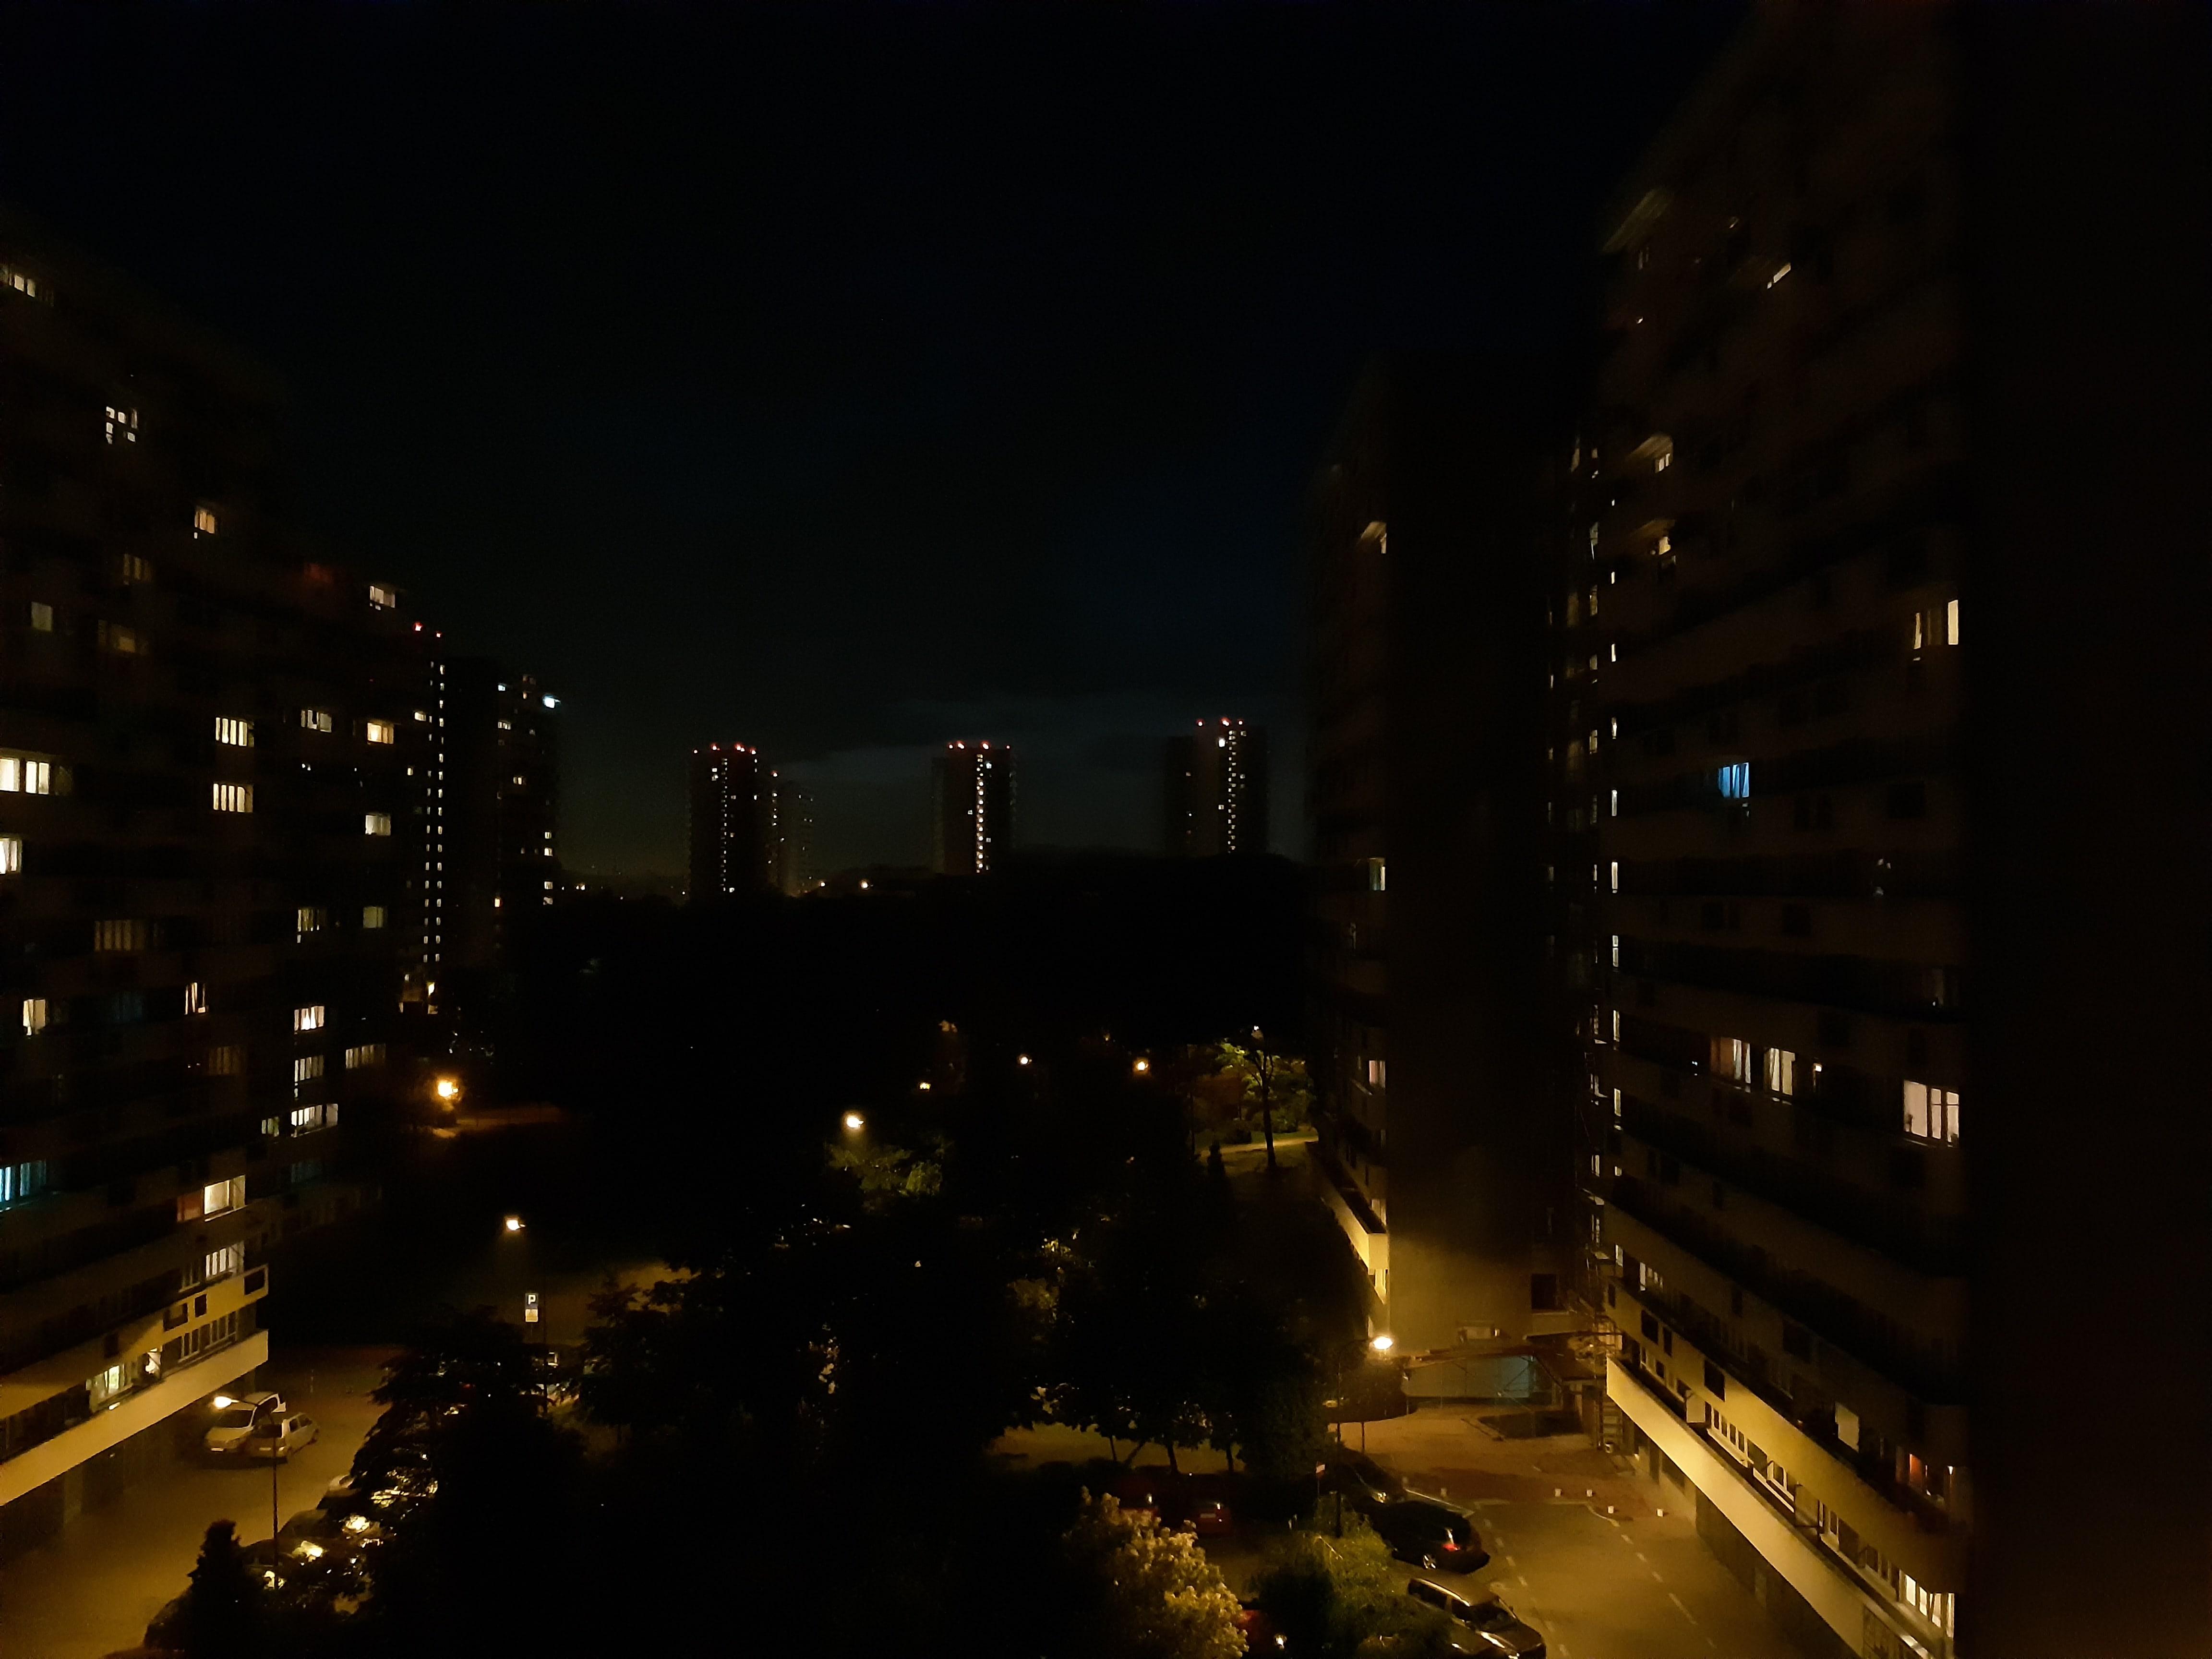 Zdjęcia nocne - Samsung Galaxy A8